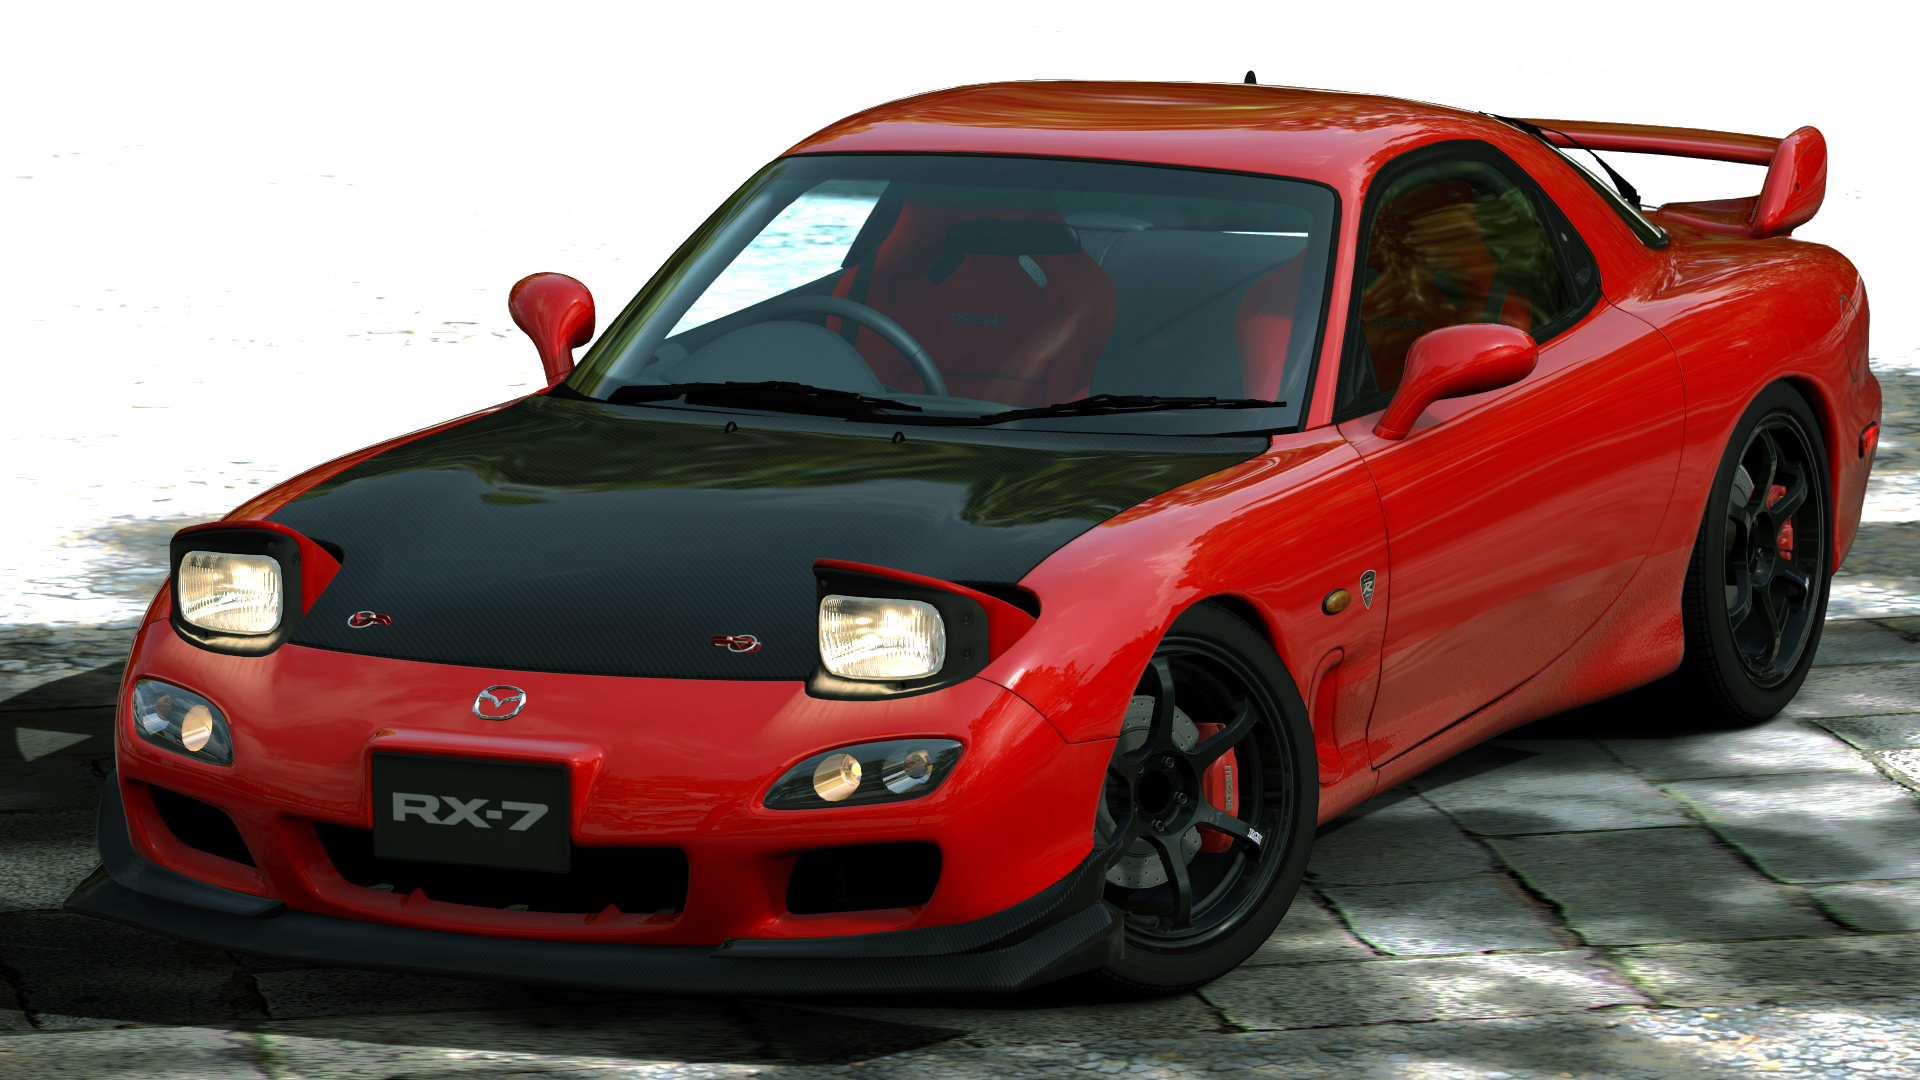 2002 Mazda RX-7 Spirit R Type A (Gran Turismo 5) by Vertualissimo